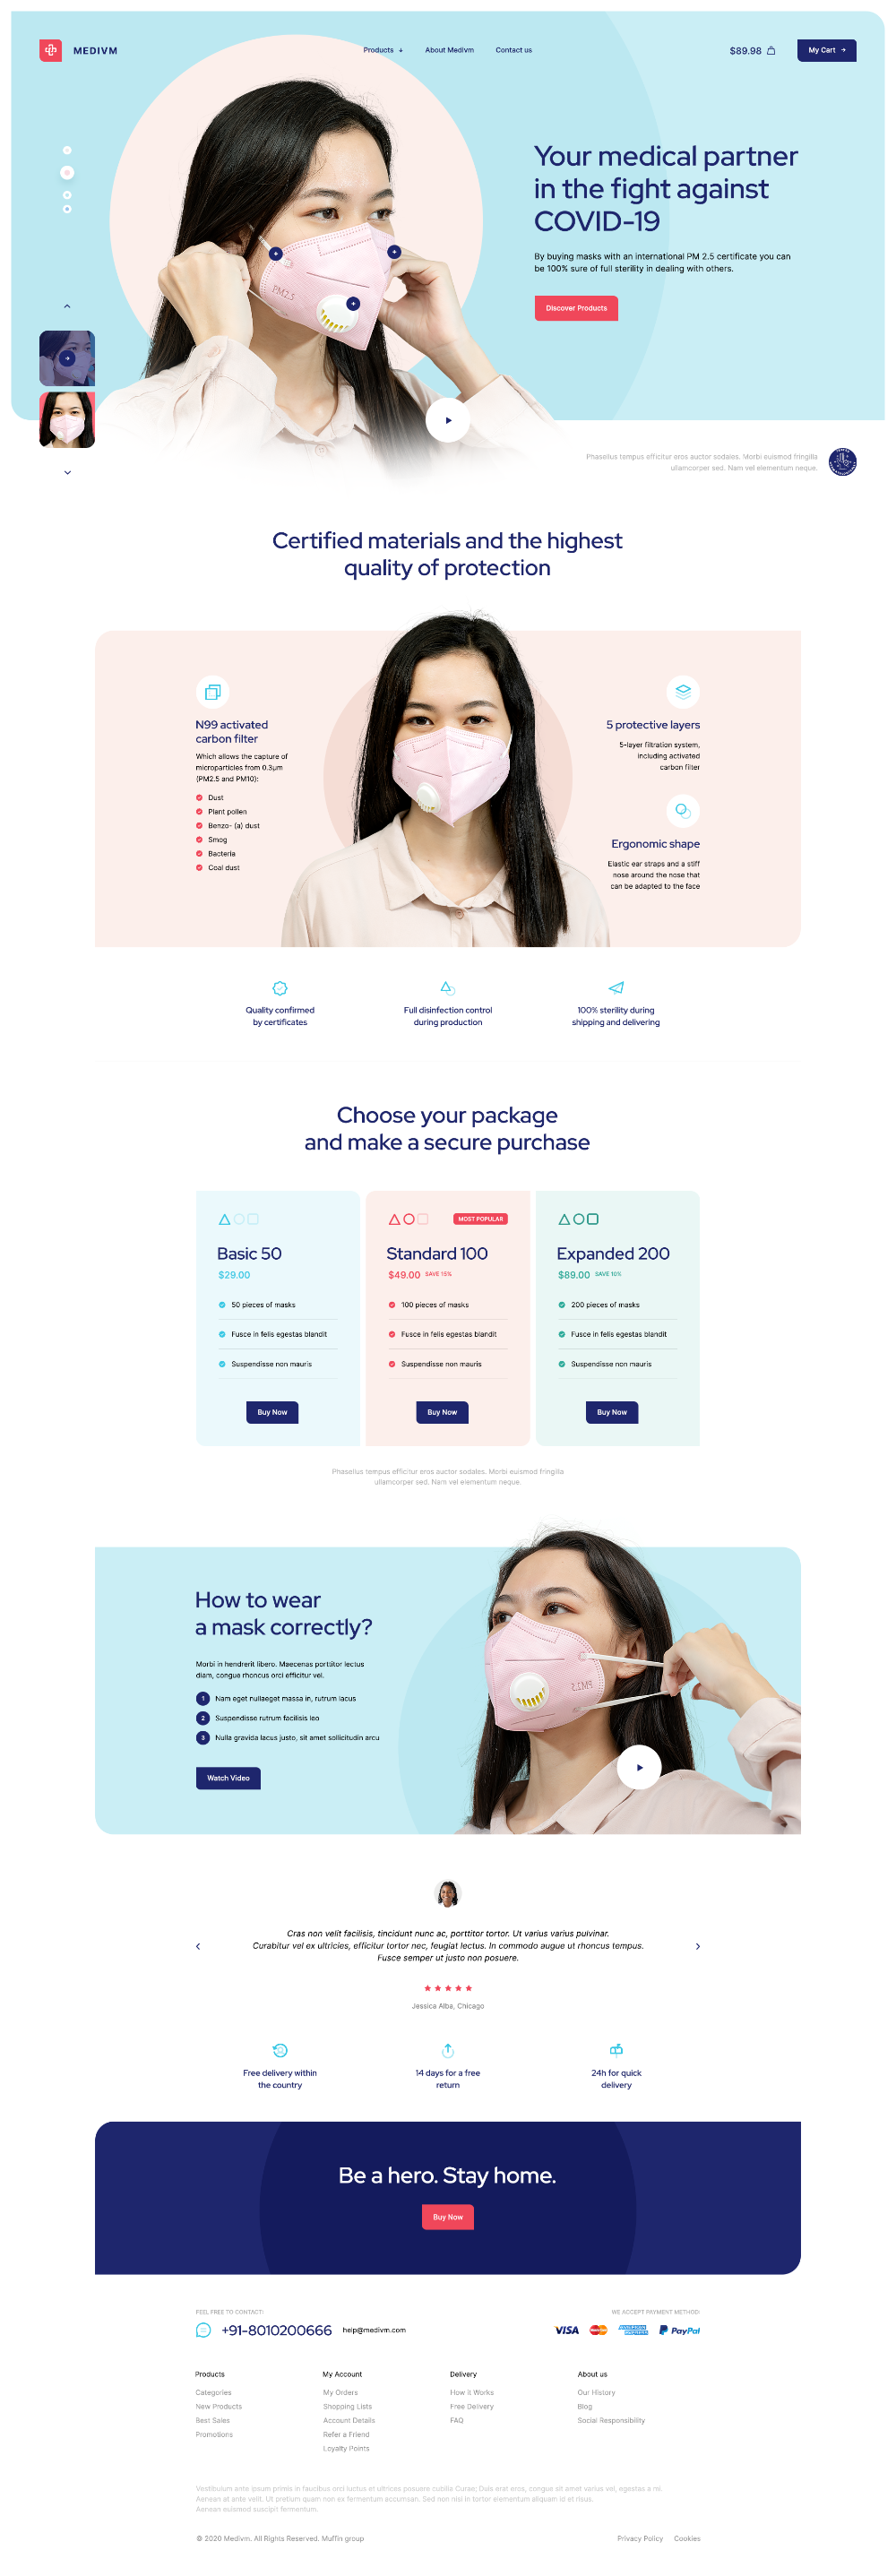 Infographics Ui Design Et Web Design: Pin On Web Design